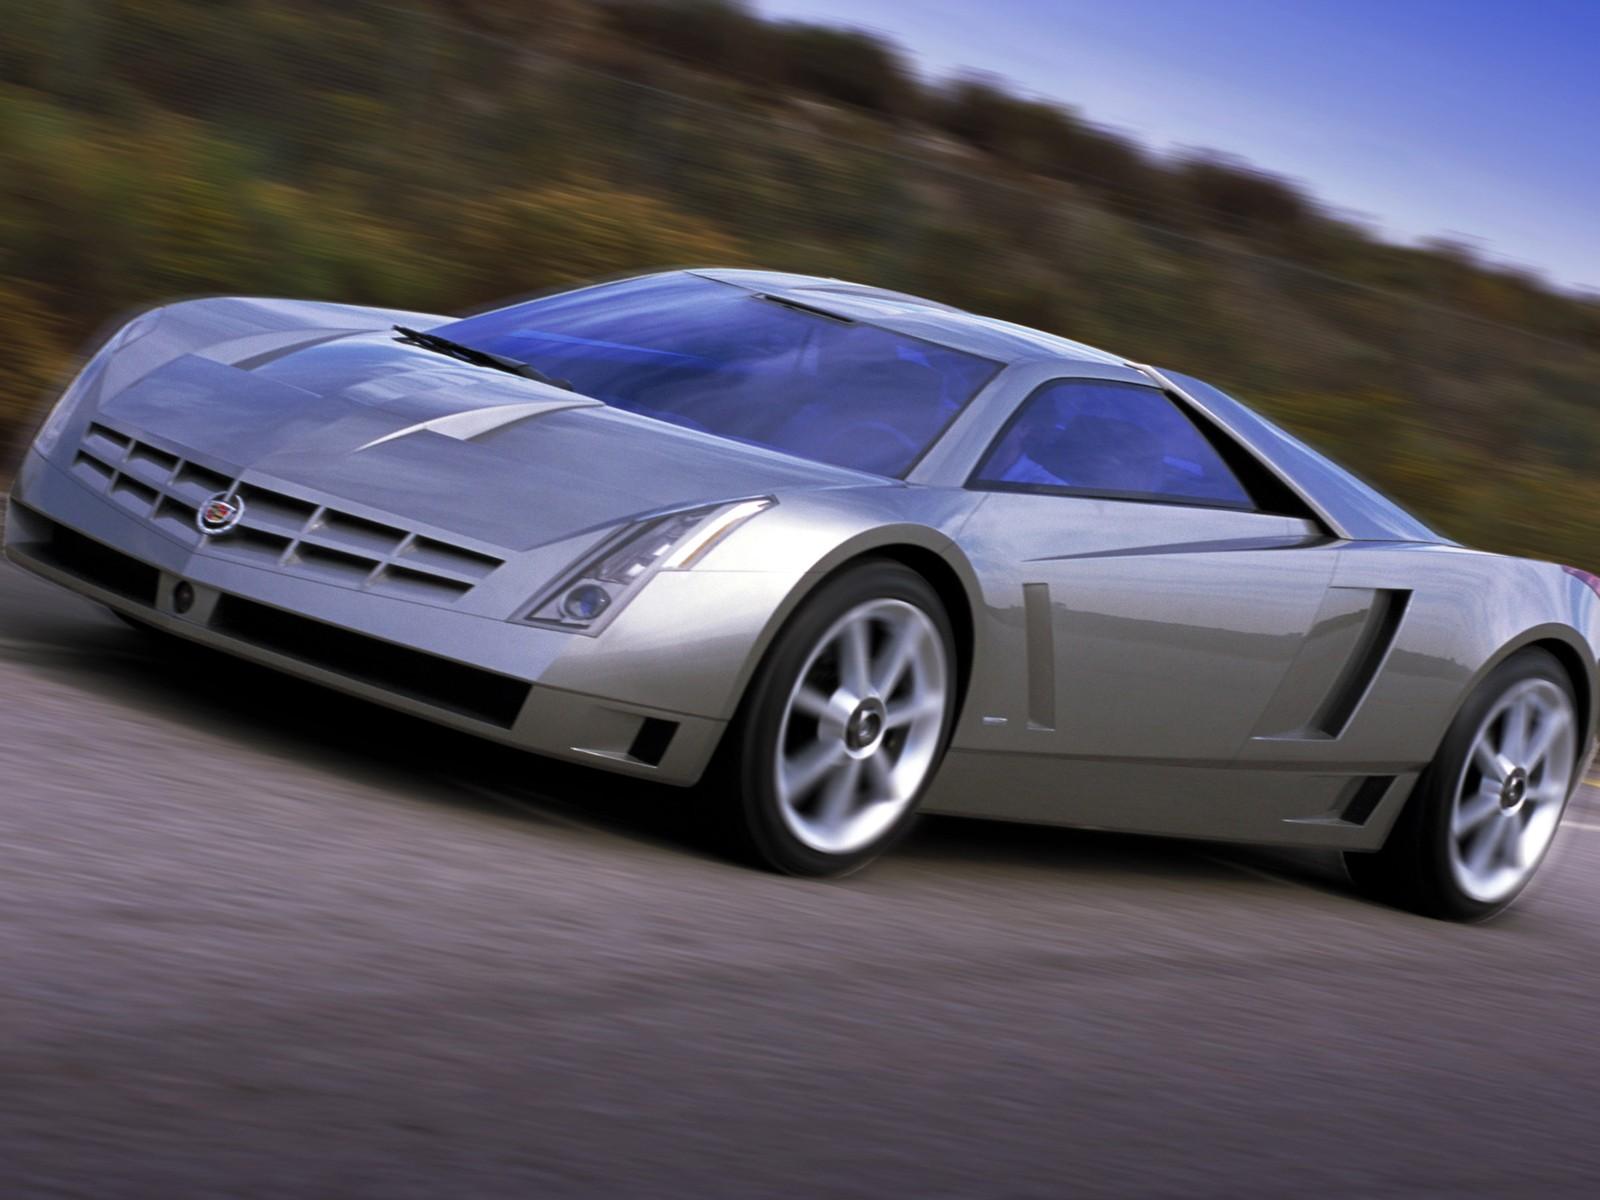 cadillac-cien-concept-004-5567f451e5994 Remarkable Lotus Carlton Gran Turismo 5 Cars Trend